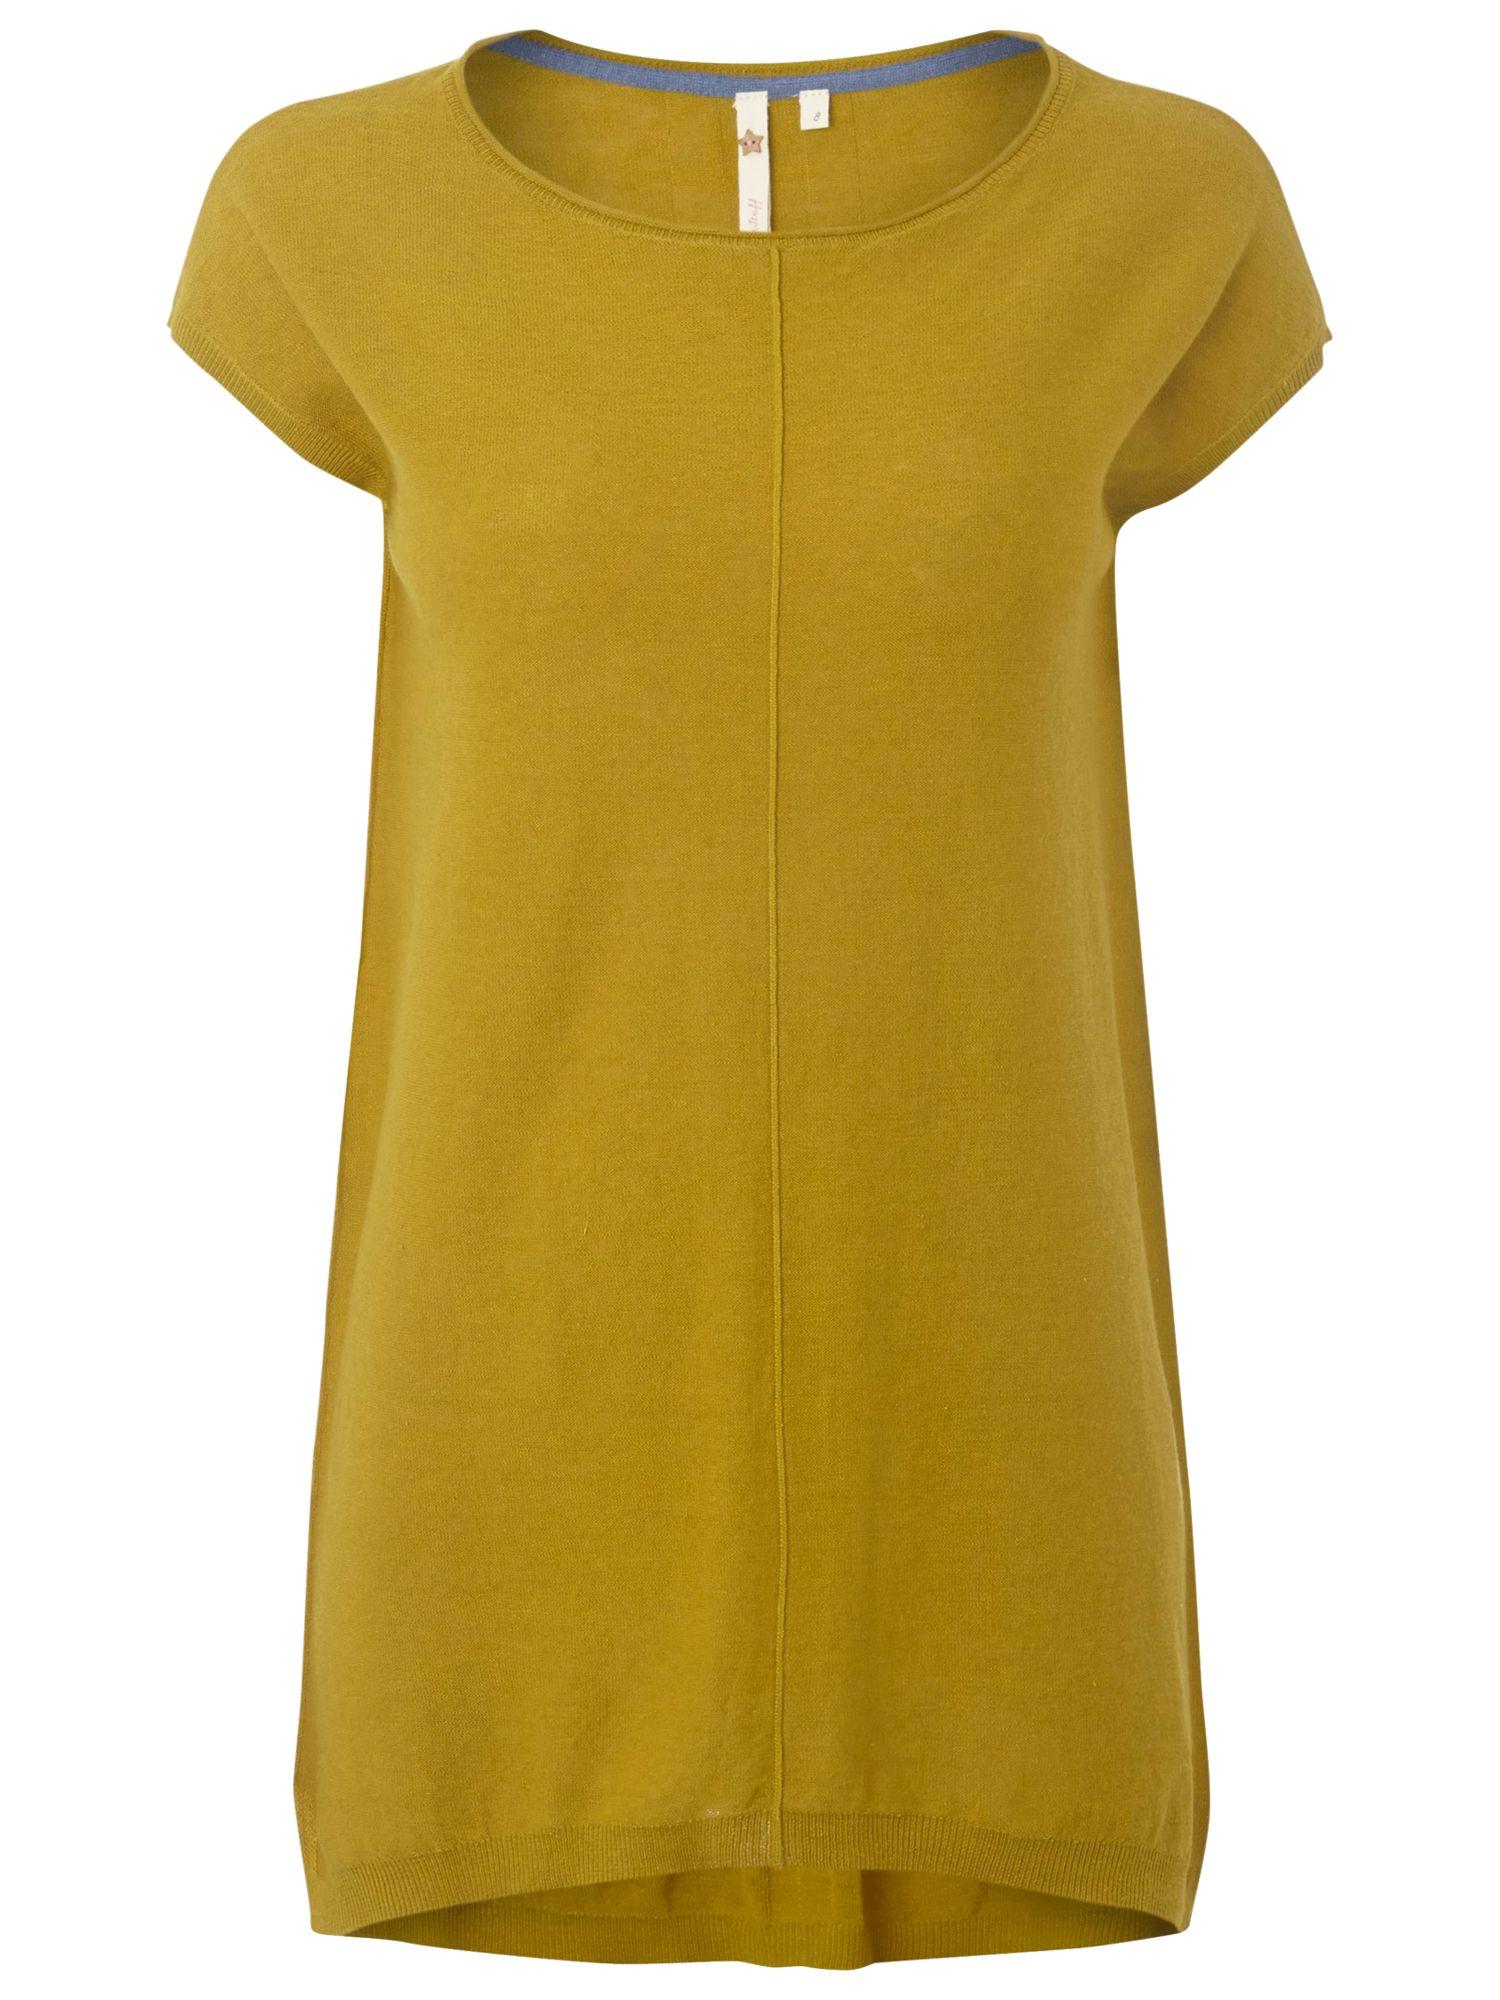 white stuff rhoda tunic dress pineapple, white, stuff, rhoda, tunic, dress, pineapple, white stuff, 16|10|18|14|12|8, women, womens dresses, brands l-z, 1919344